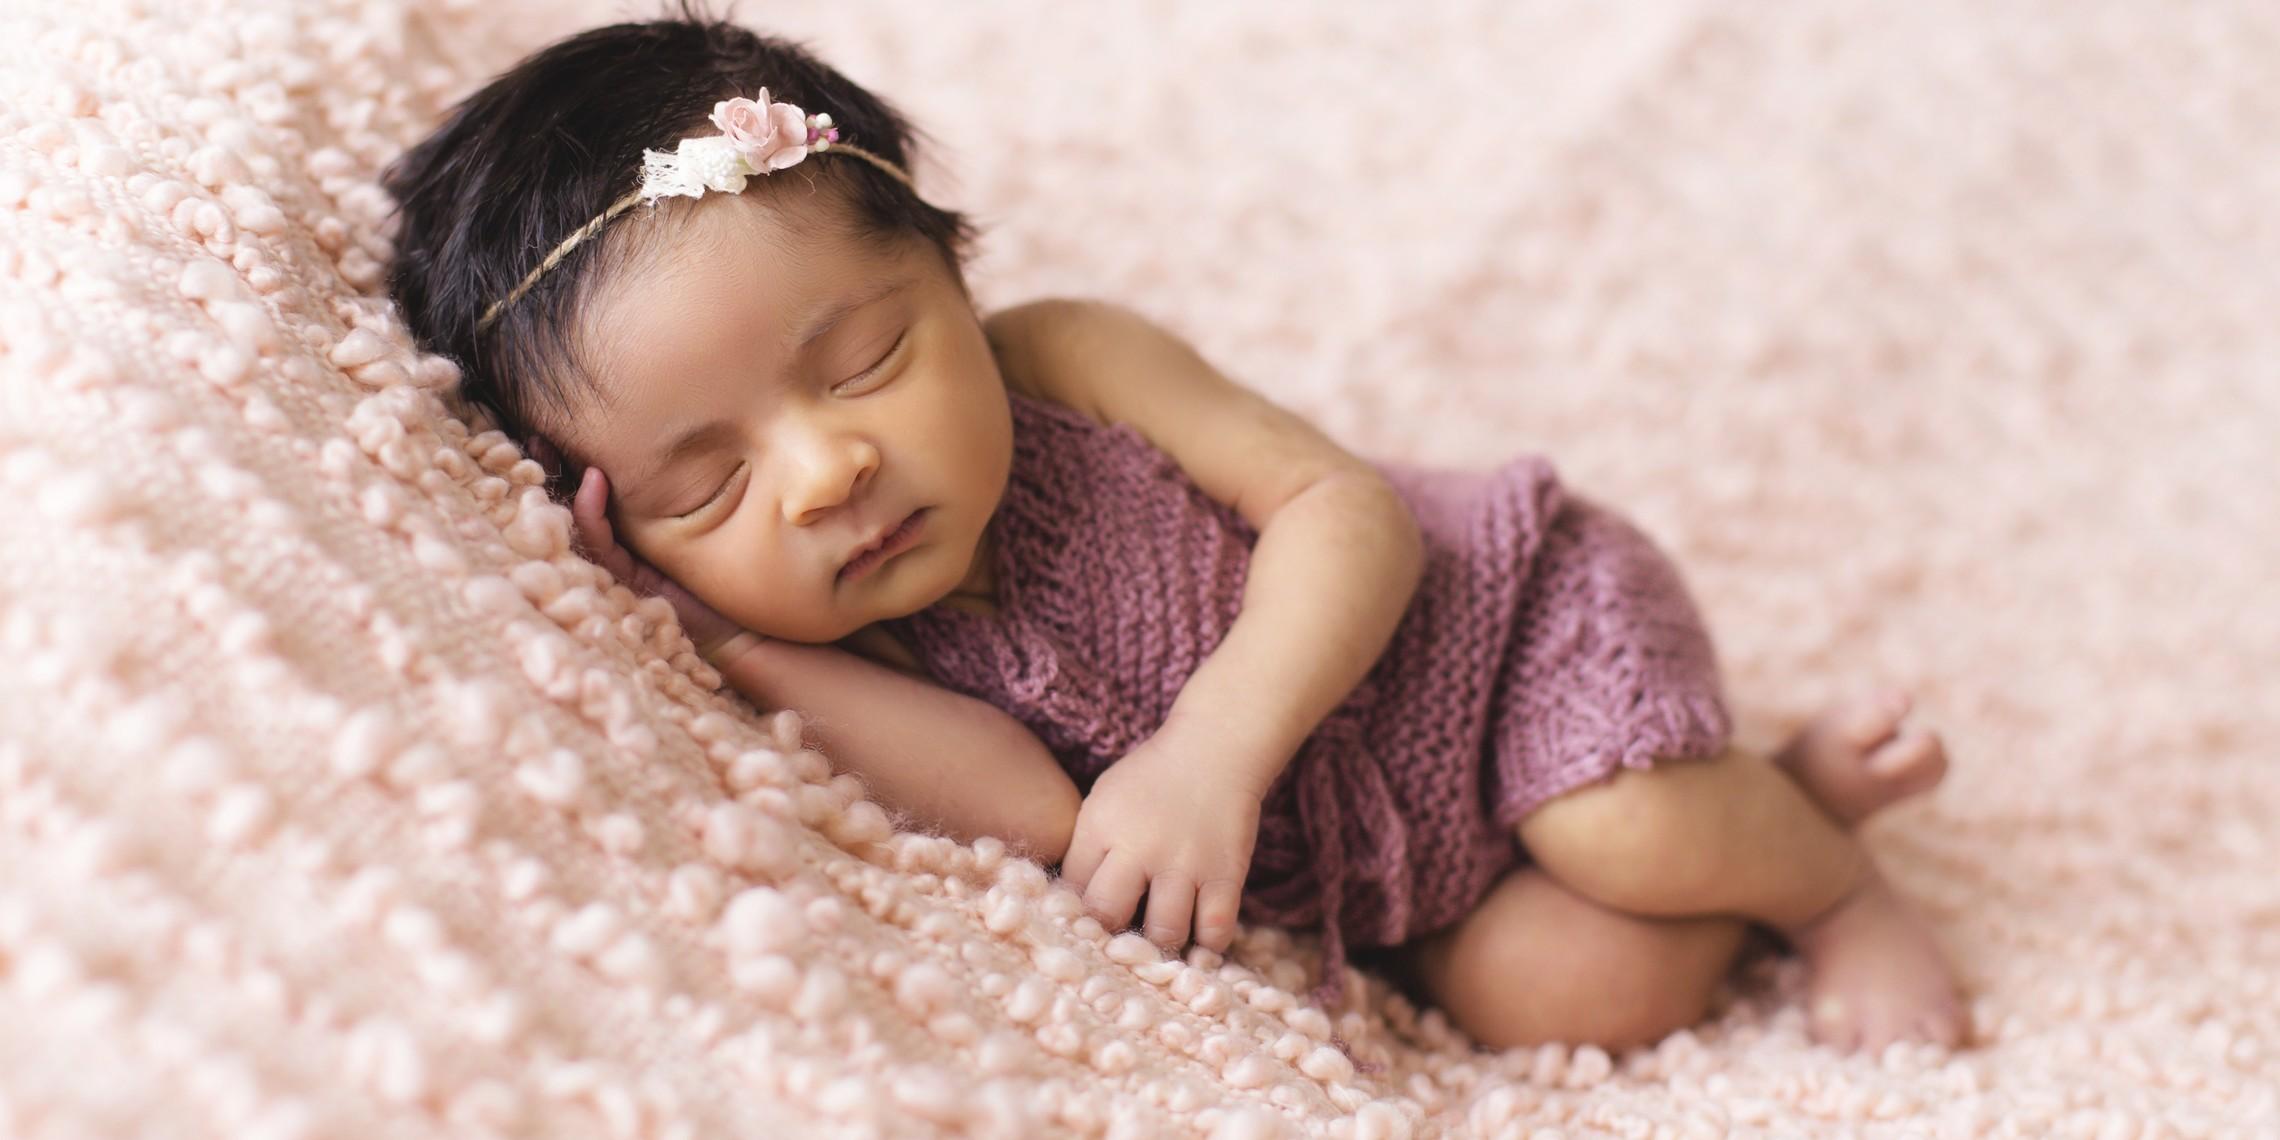 Adorable Baby Blanket 1442005